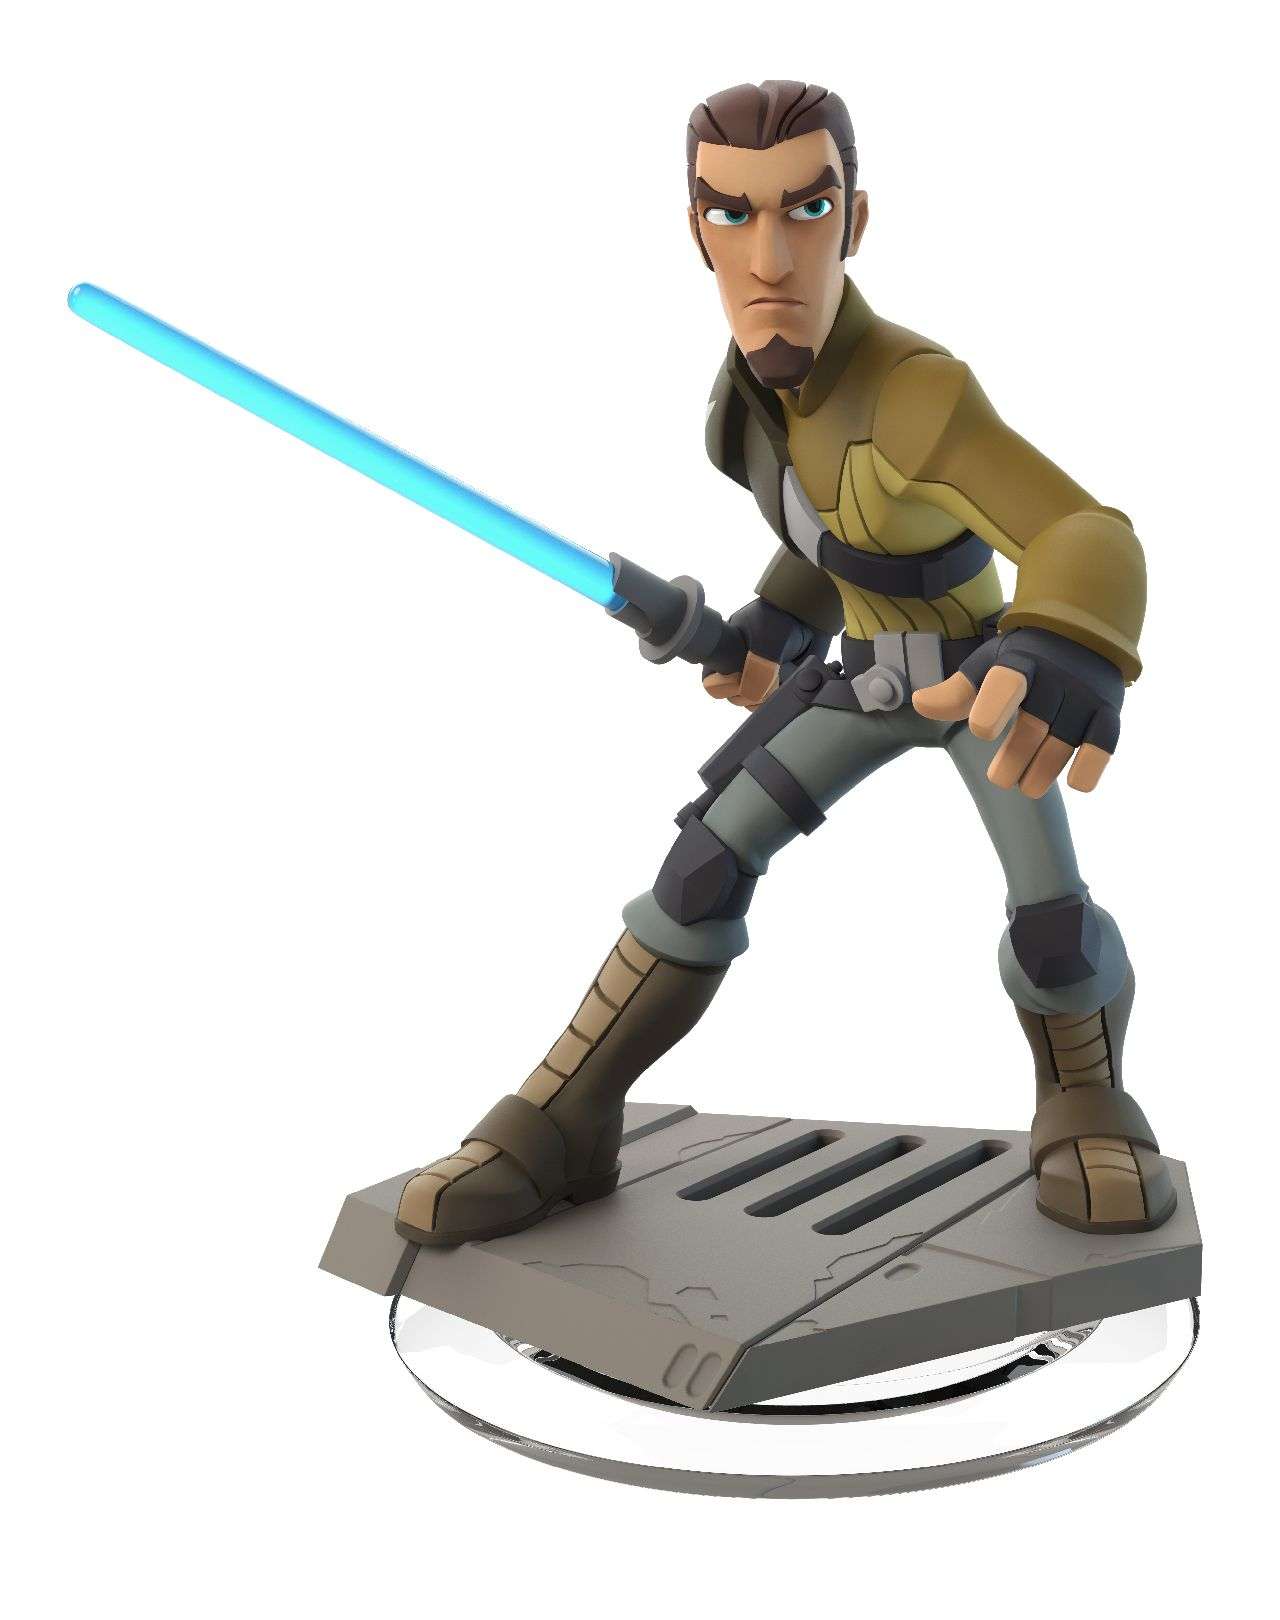 Star Wars Disney Character Figures Disney-infinity-3-star-wars